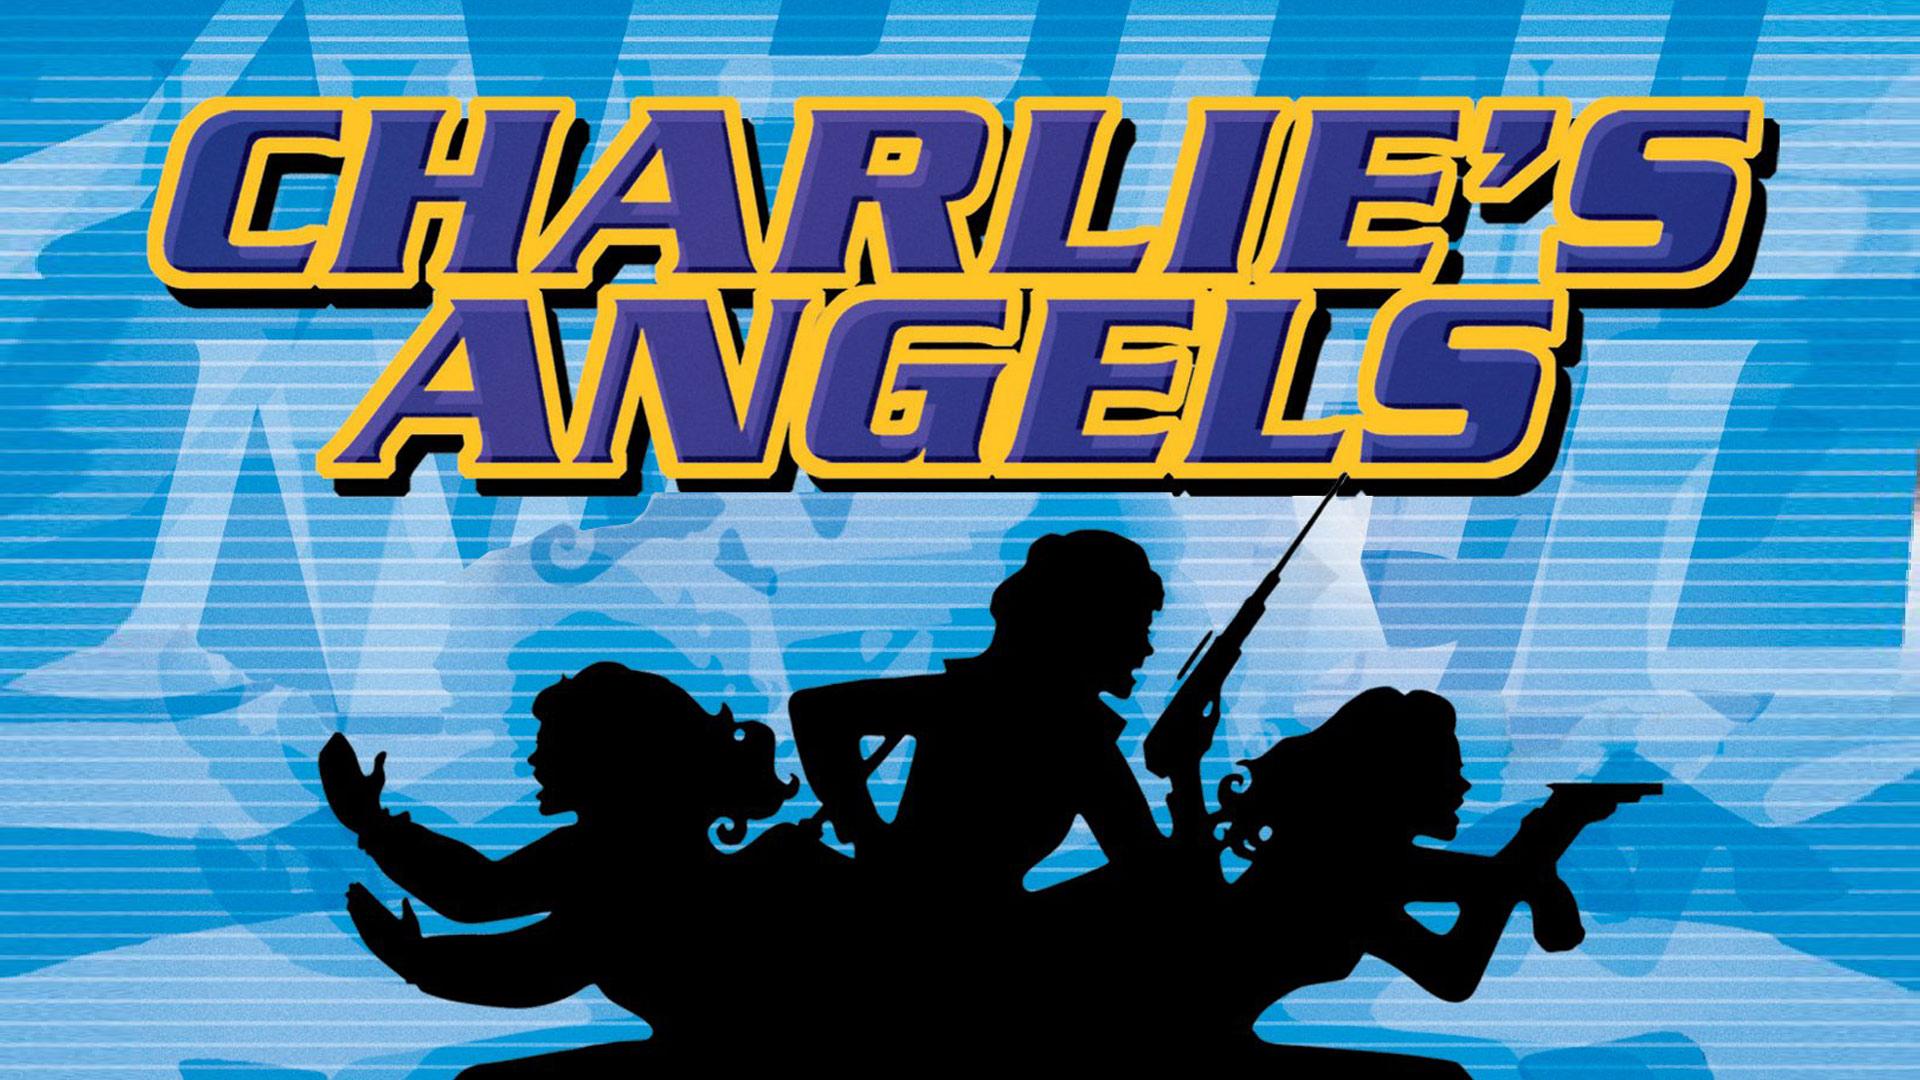 Charlie's Angels Season 1